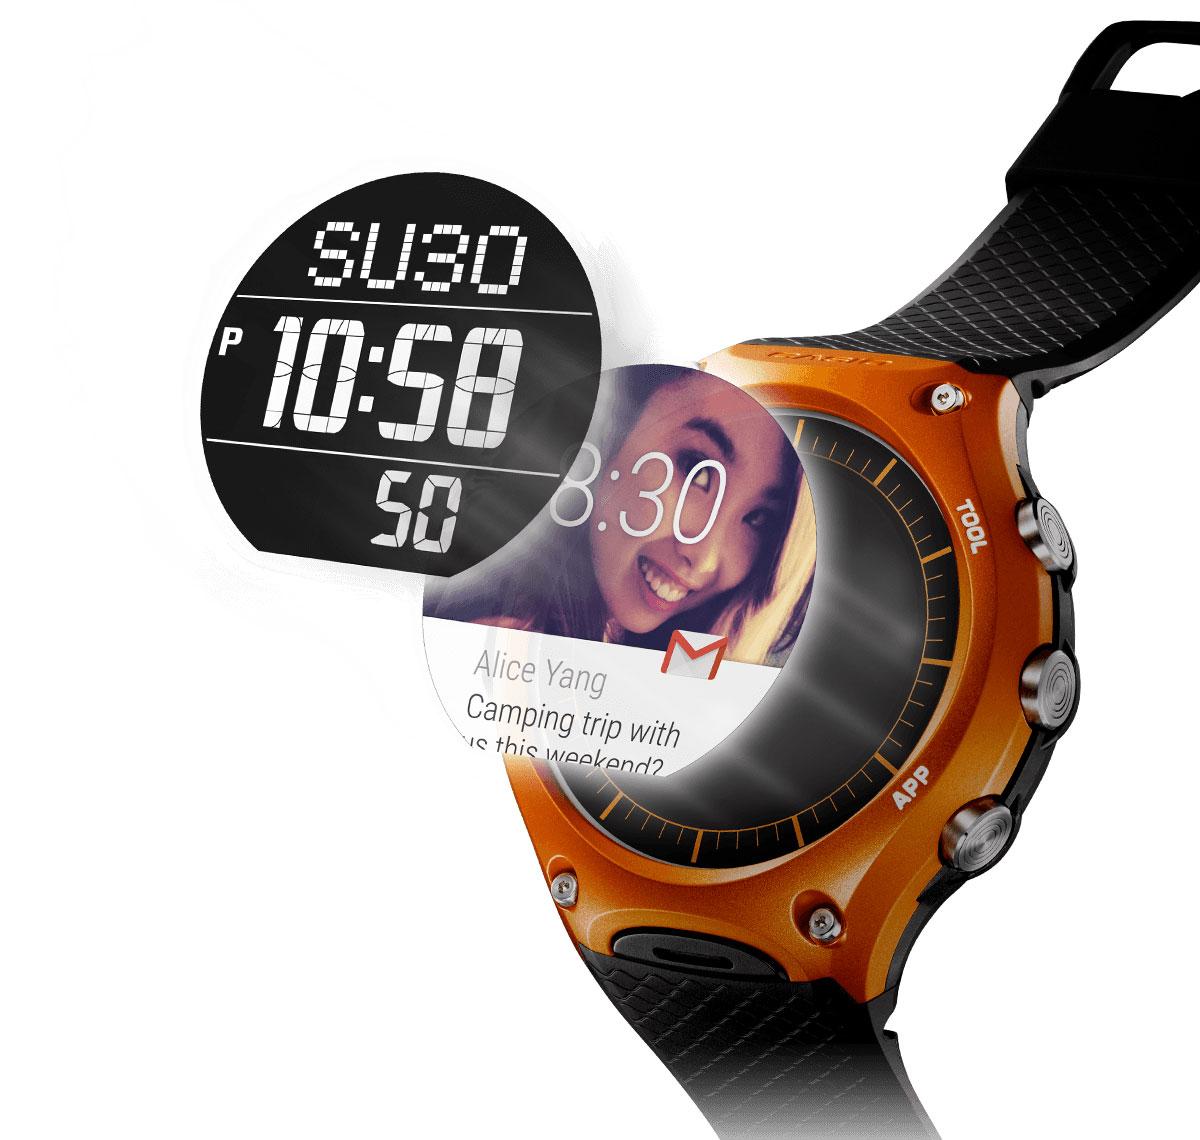 news-casio-wsd-f10-smartwatch-2